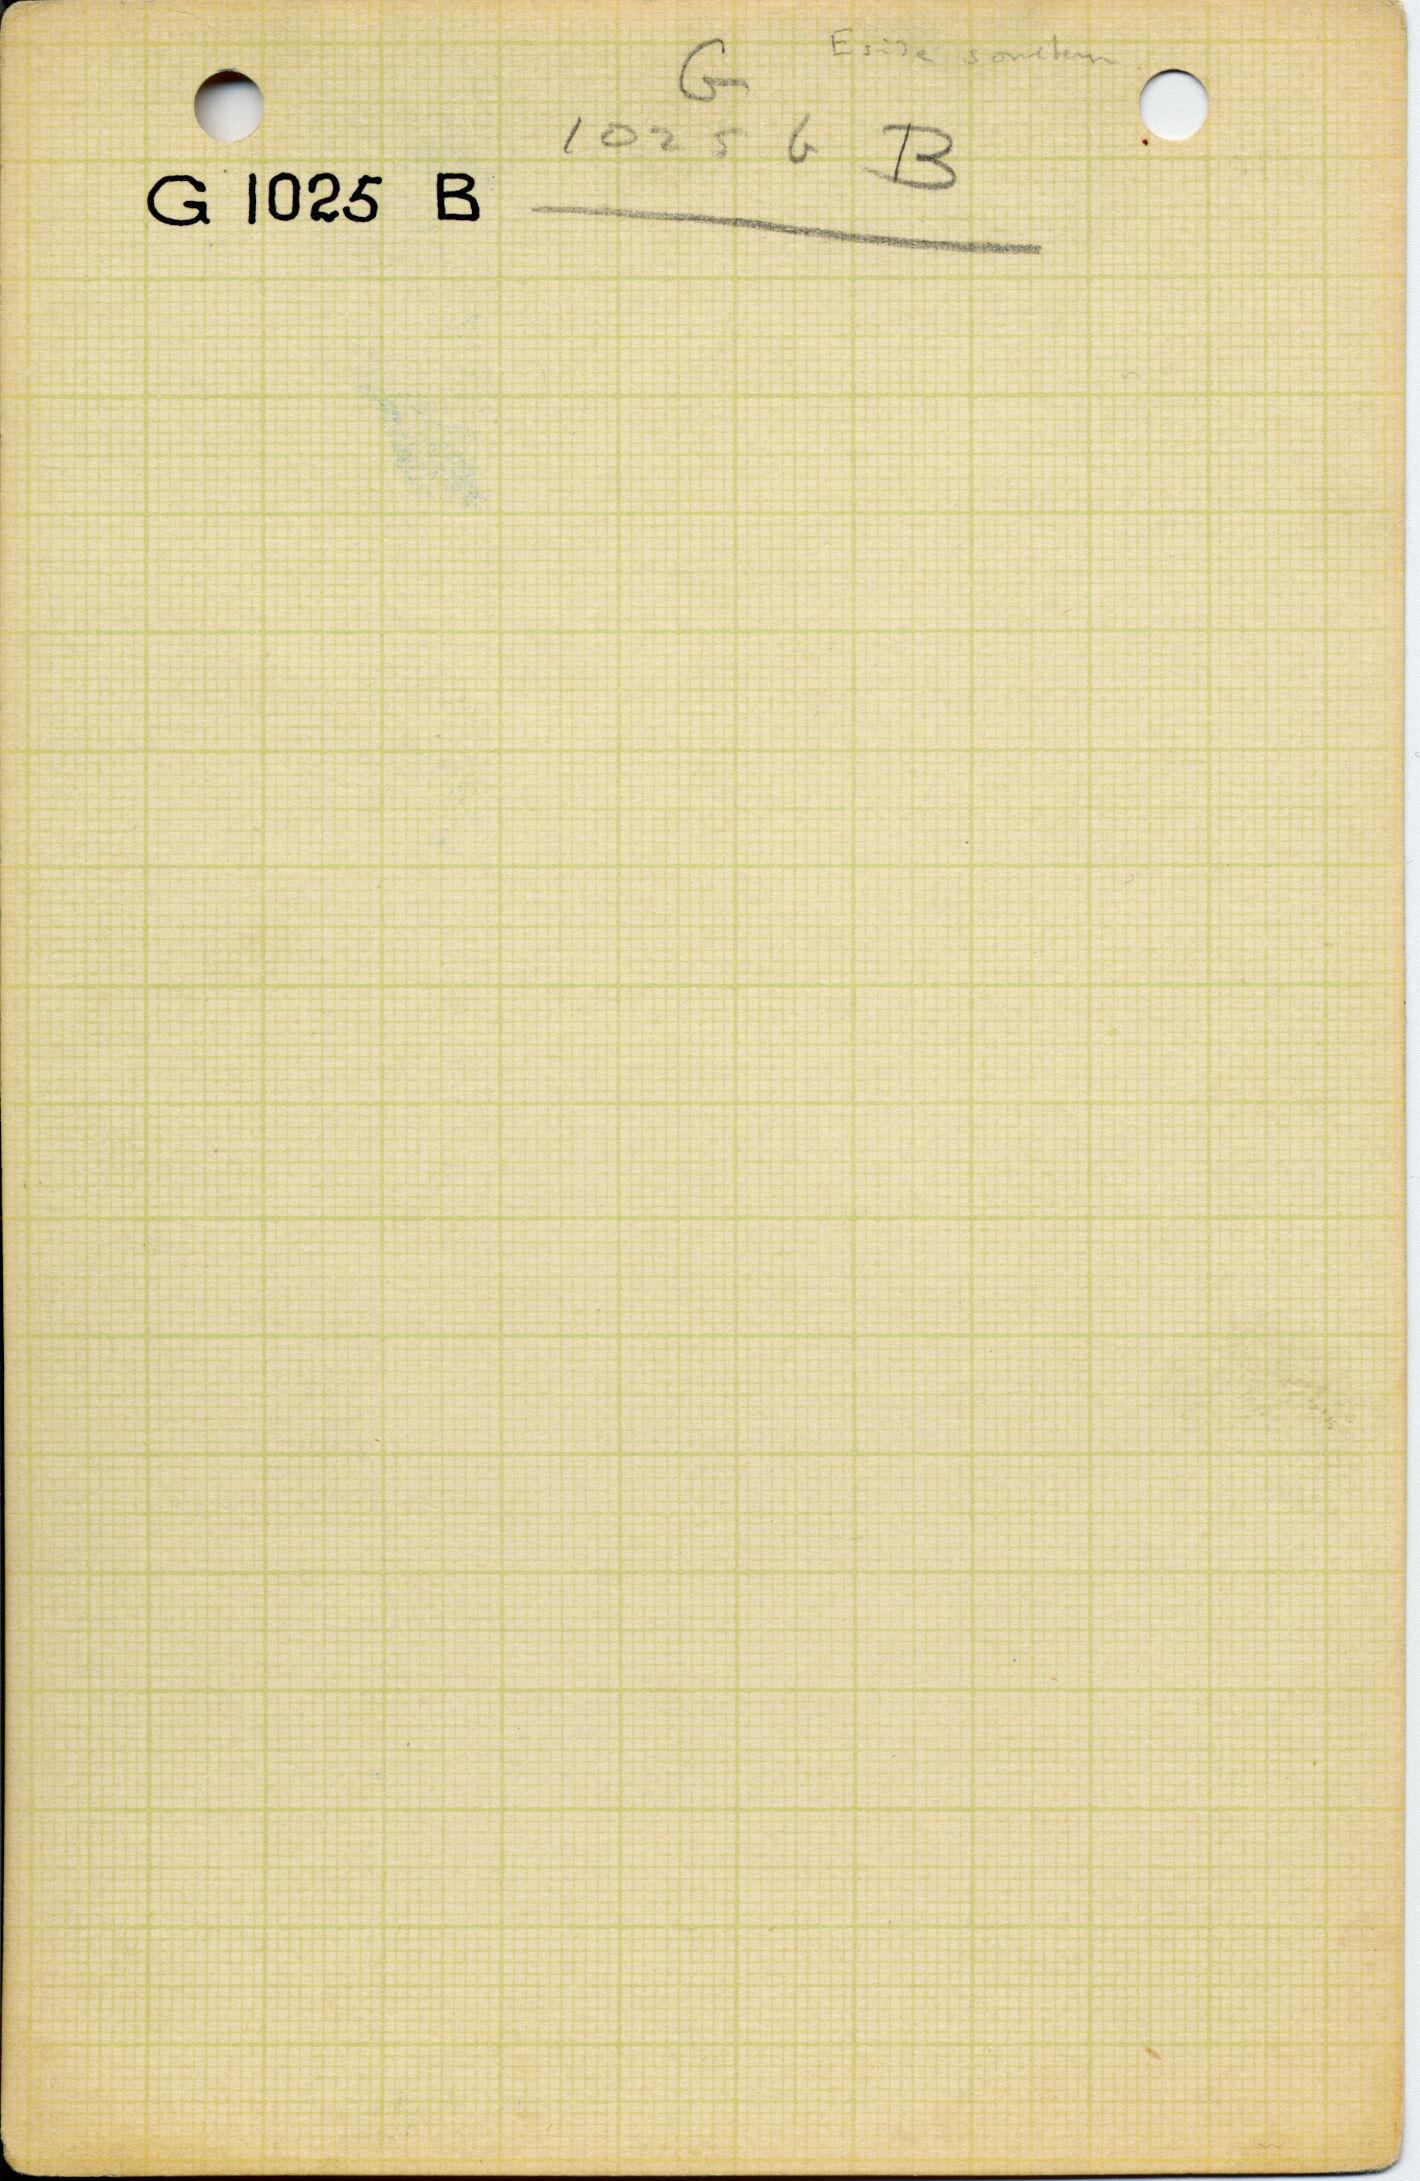 Notes: G 1025b[?], Shaft B (blank card)